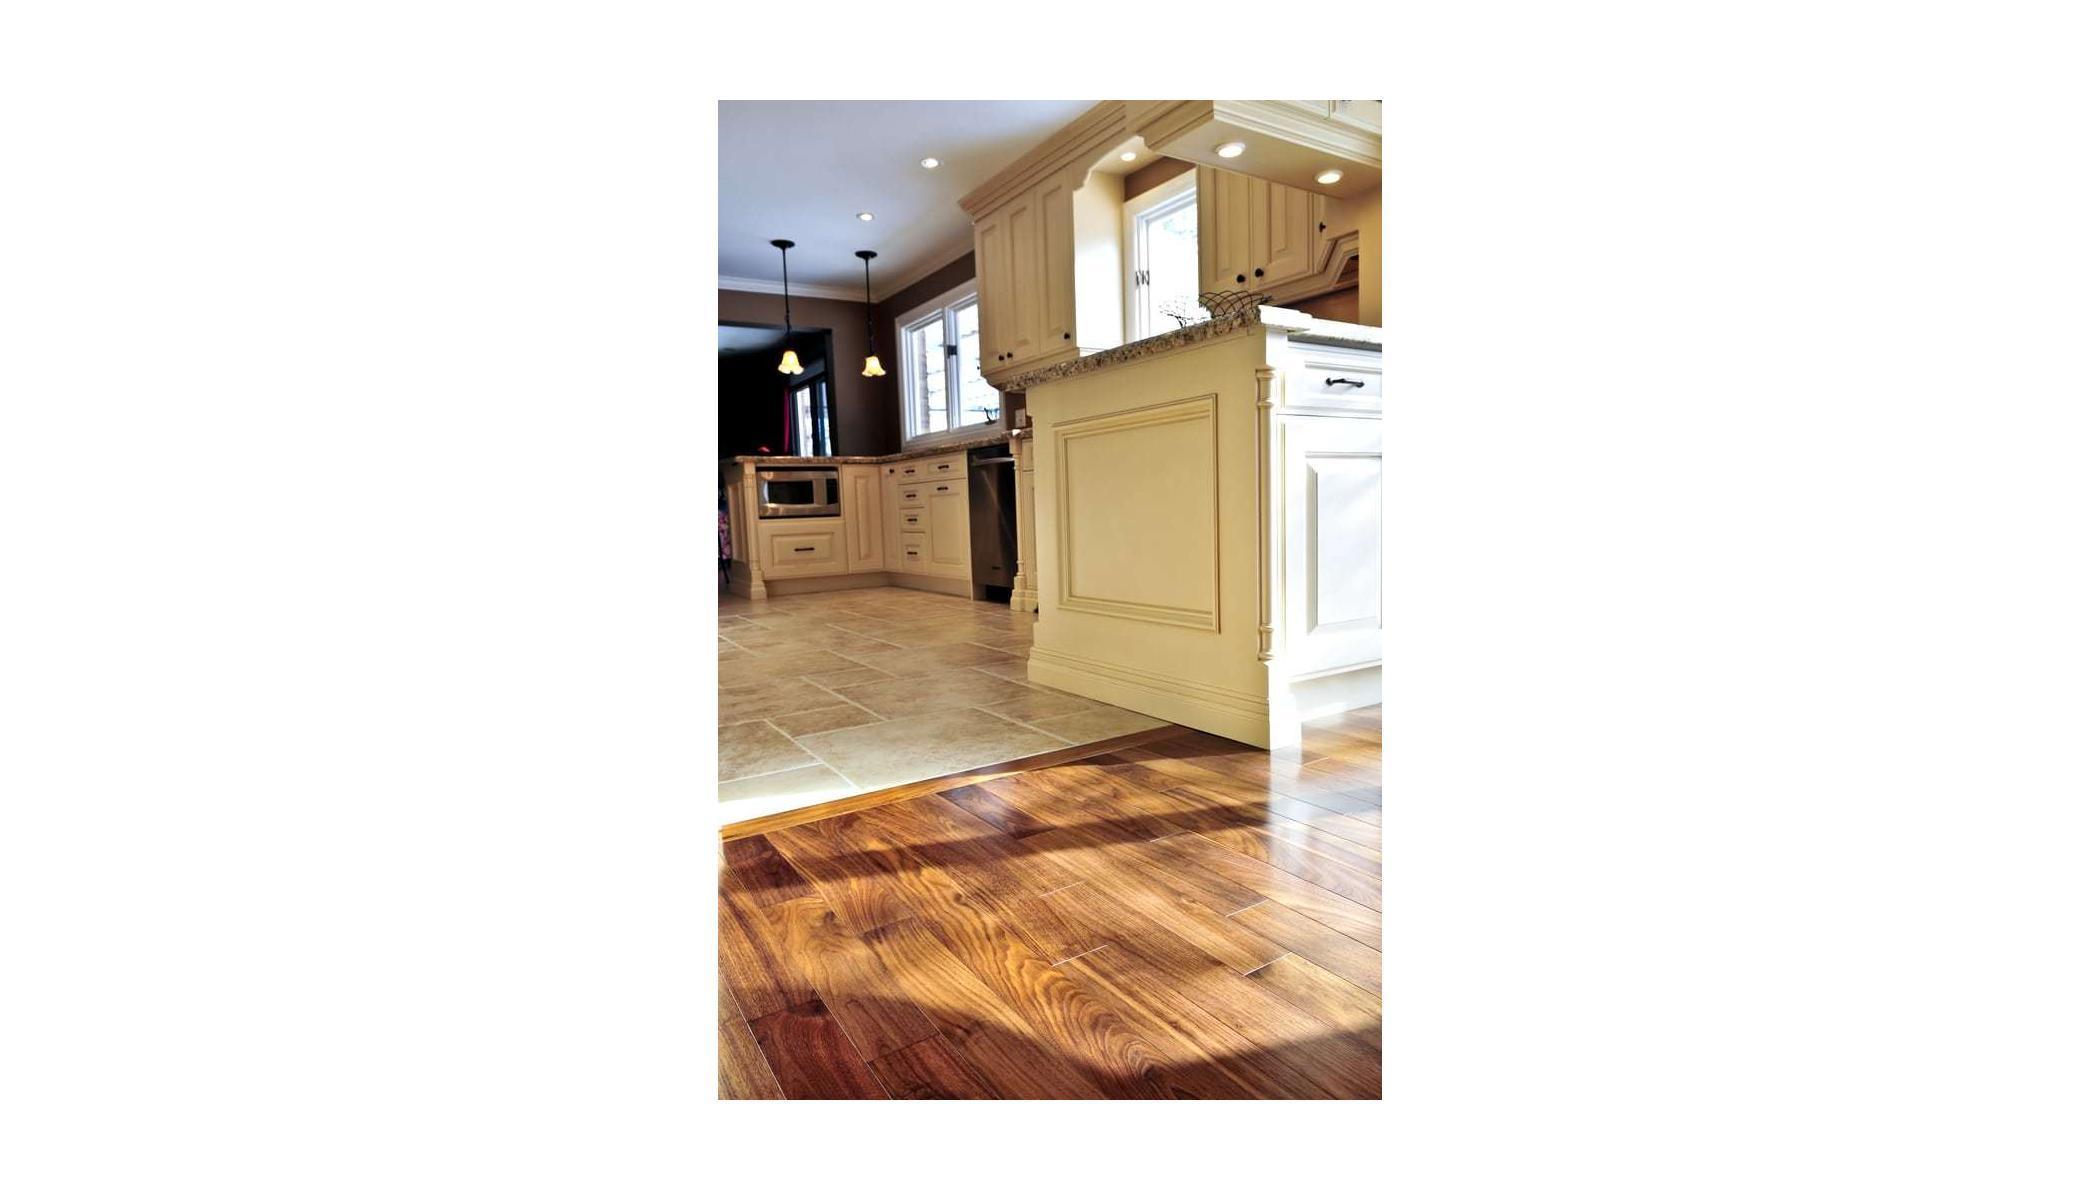 tile vs hardwood floors what should